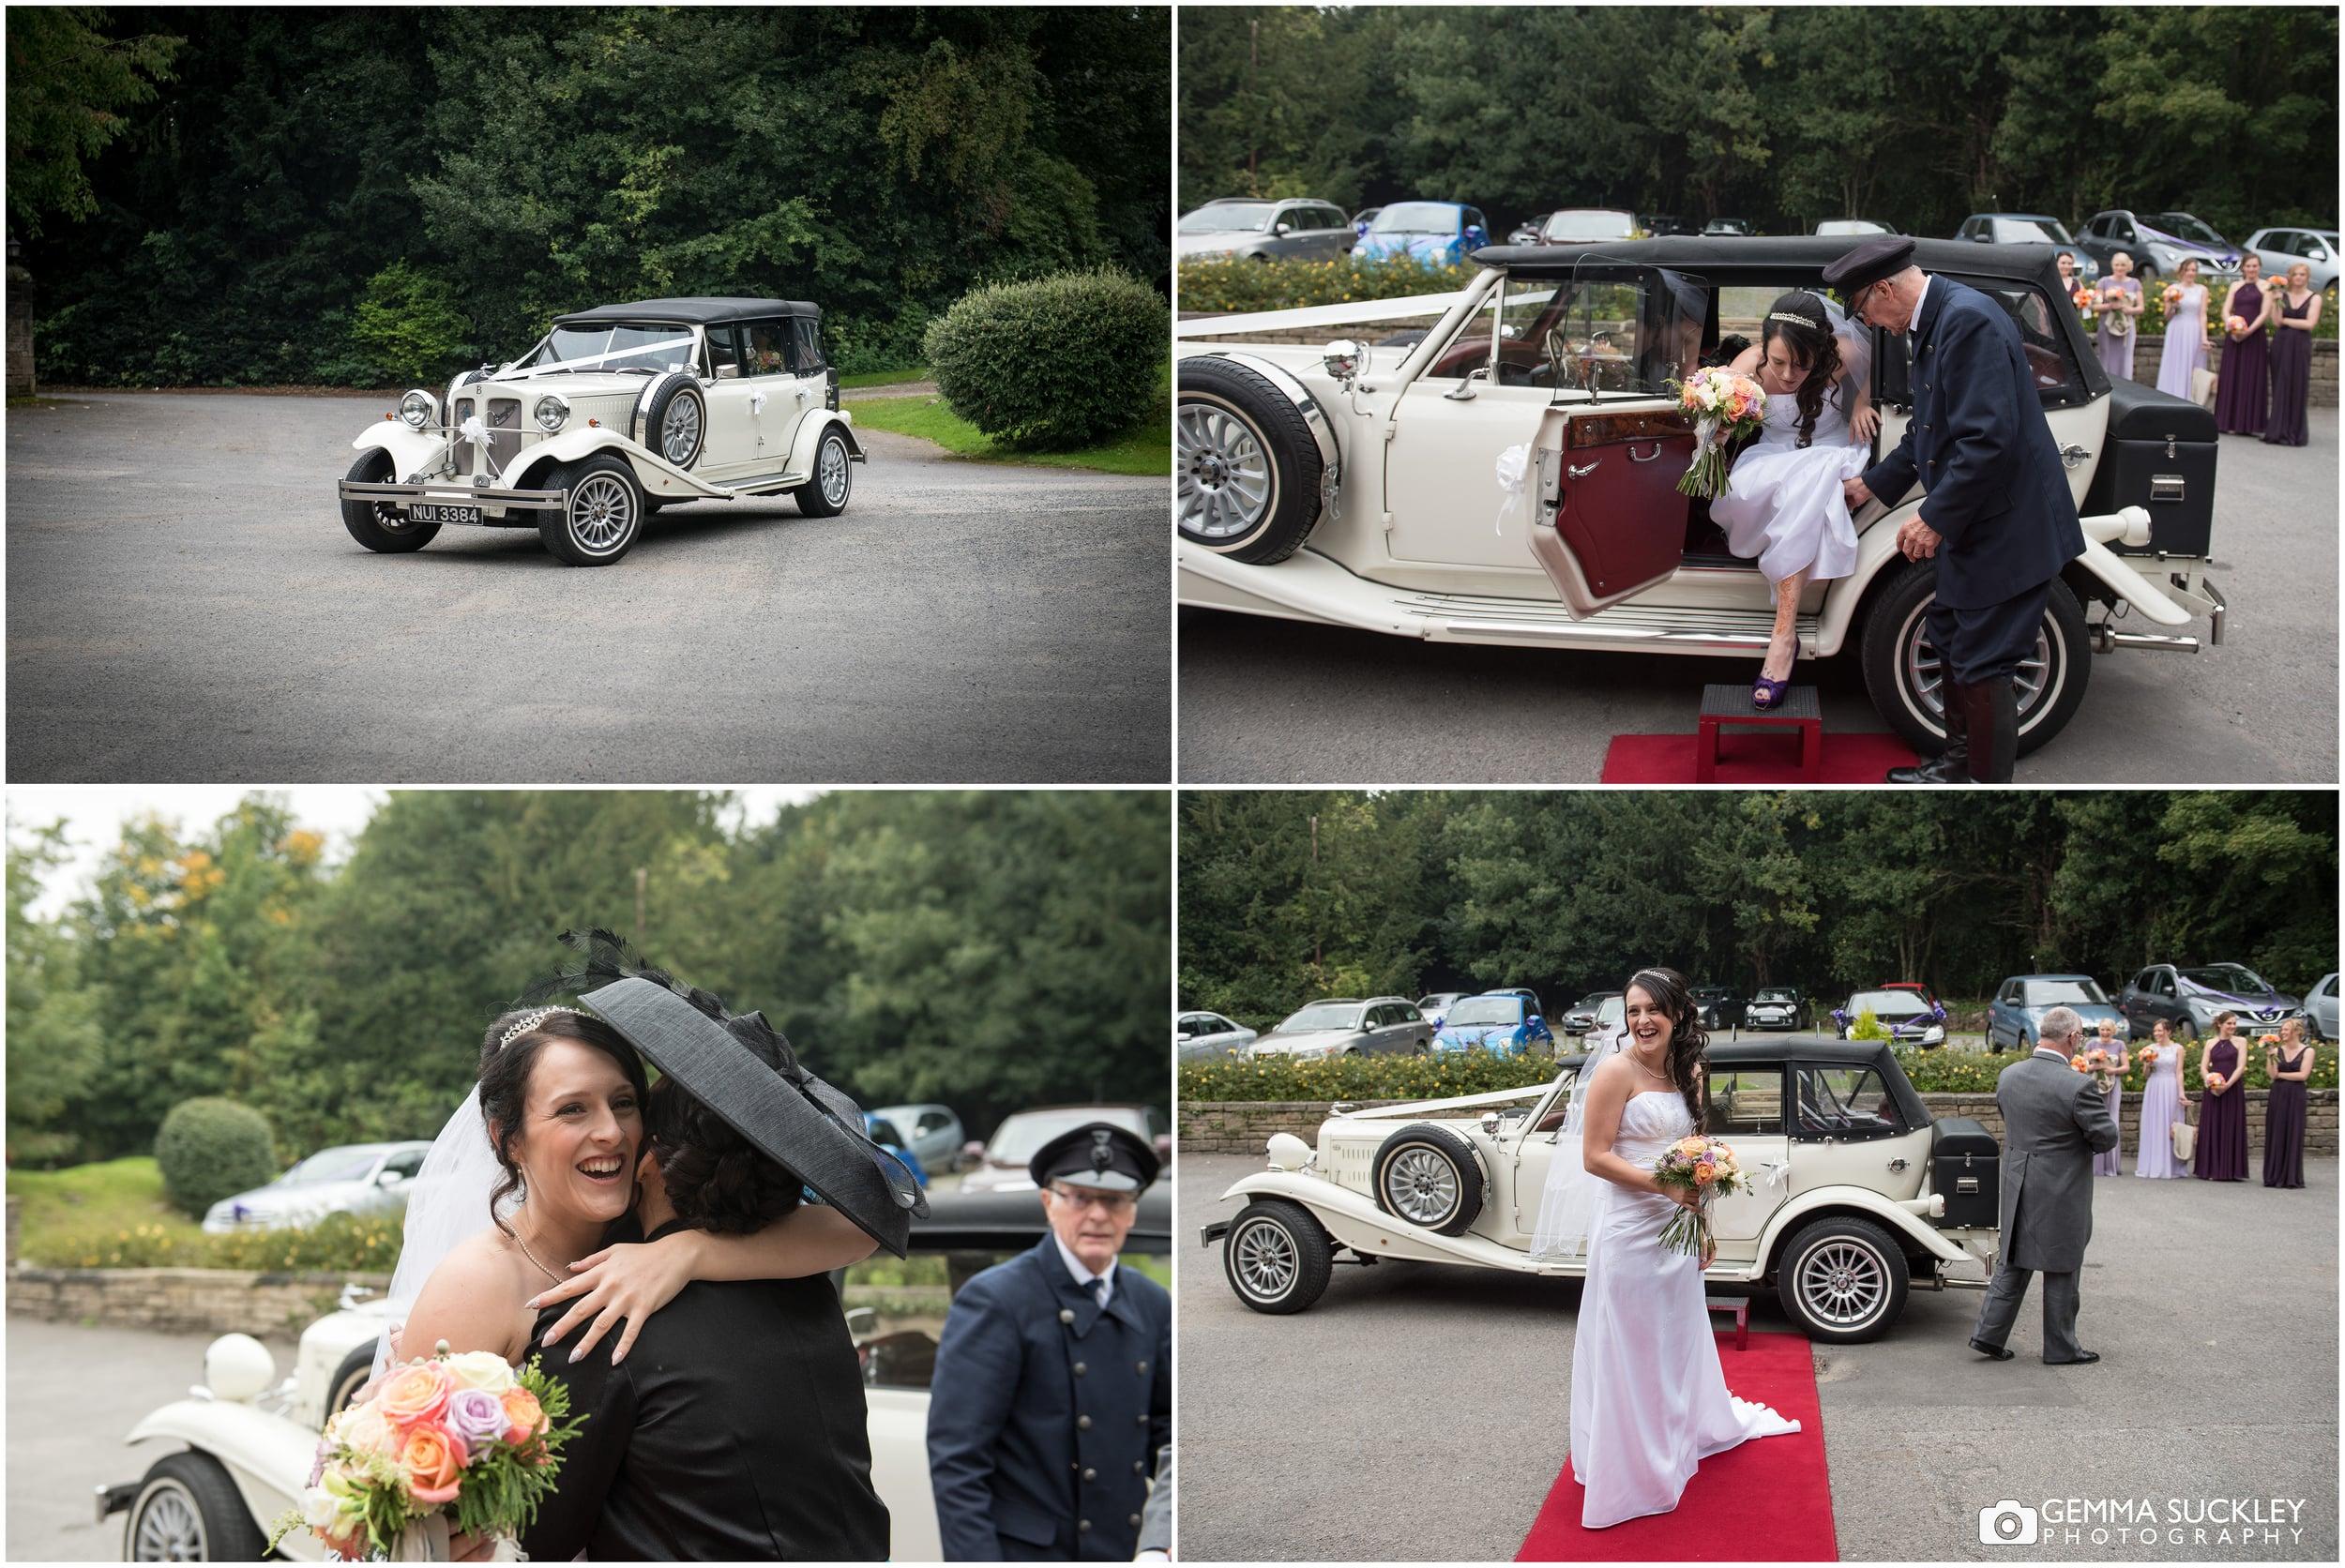 bridal-arrival-at-hoyle-court.jpg